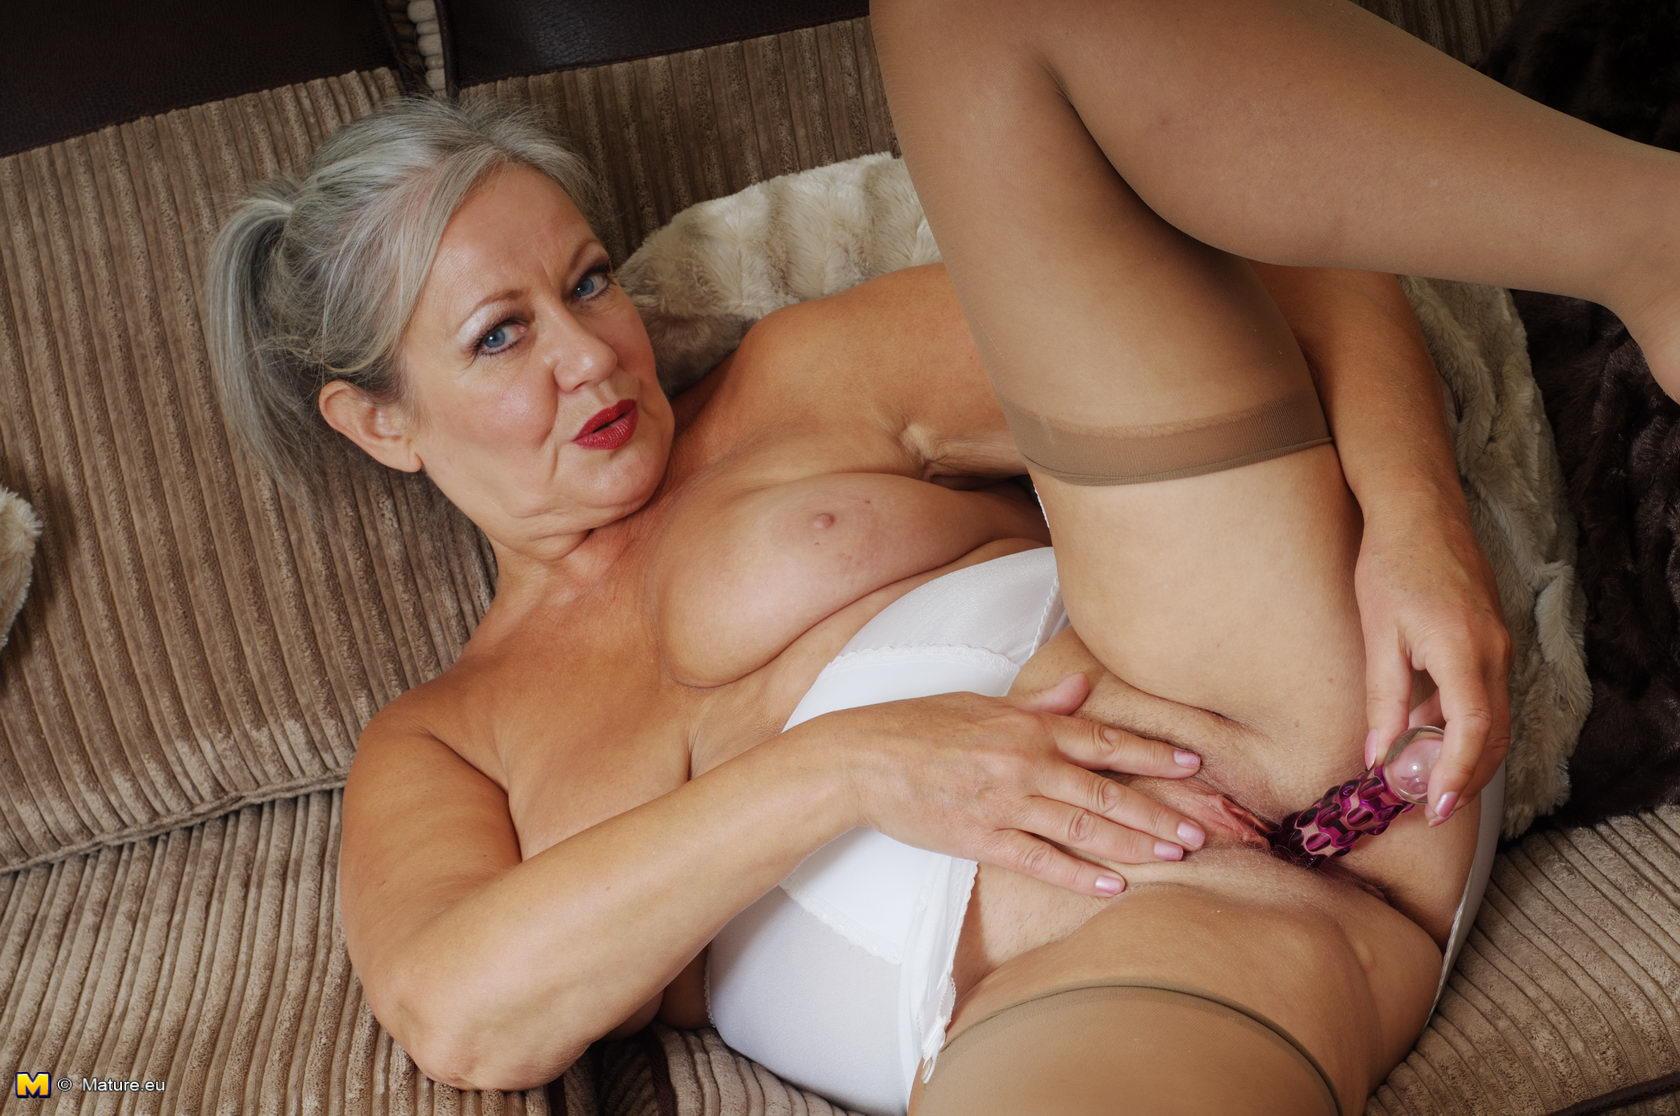 Naughty Mature Slut Getting Very Dirty Bu Herself Free Download